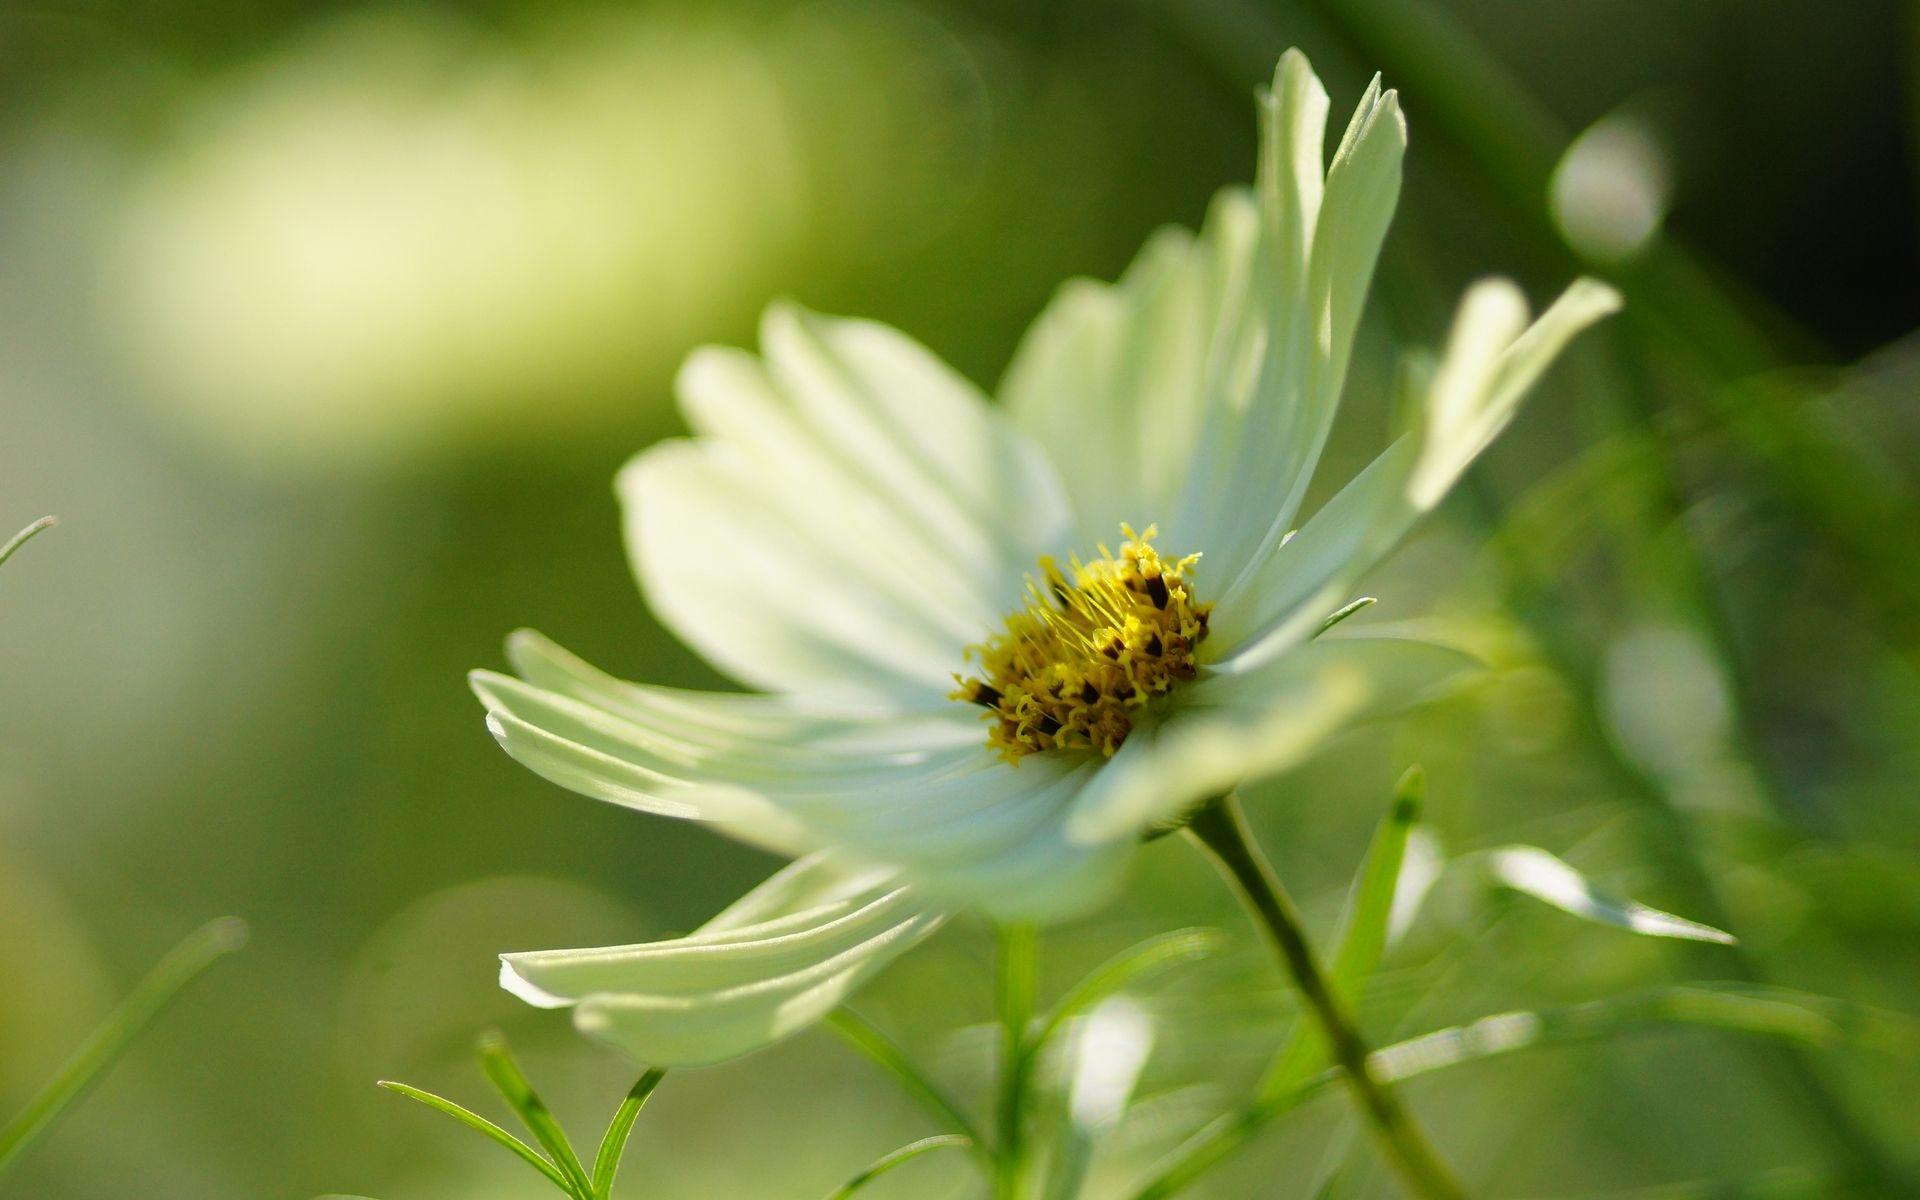 White Cosmos Flower Fleur Cosmos Blanc Wallpaper Forwallpaper